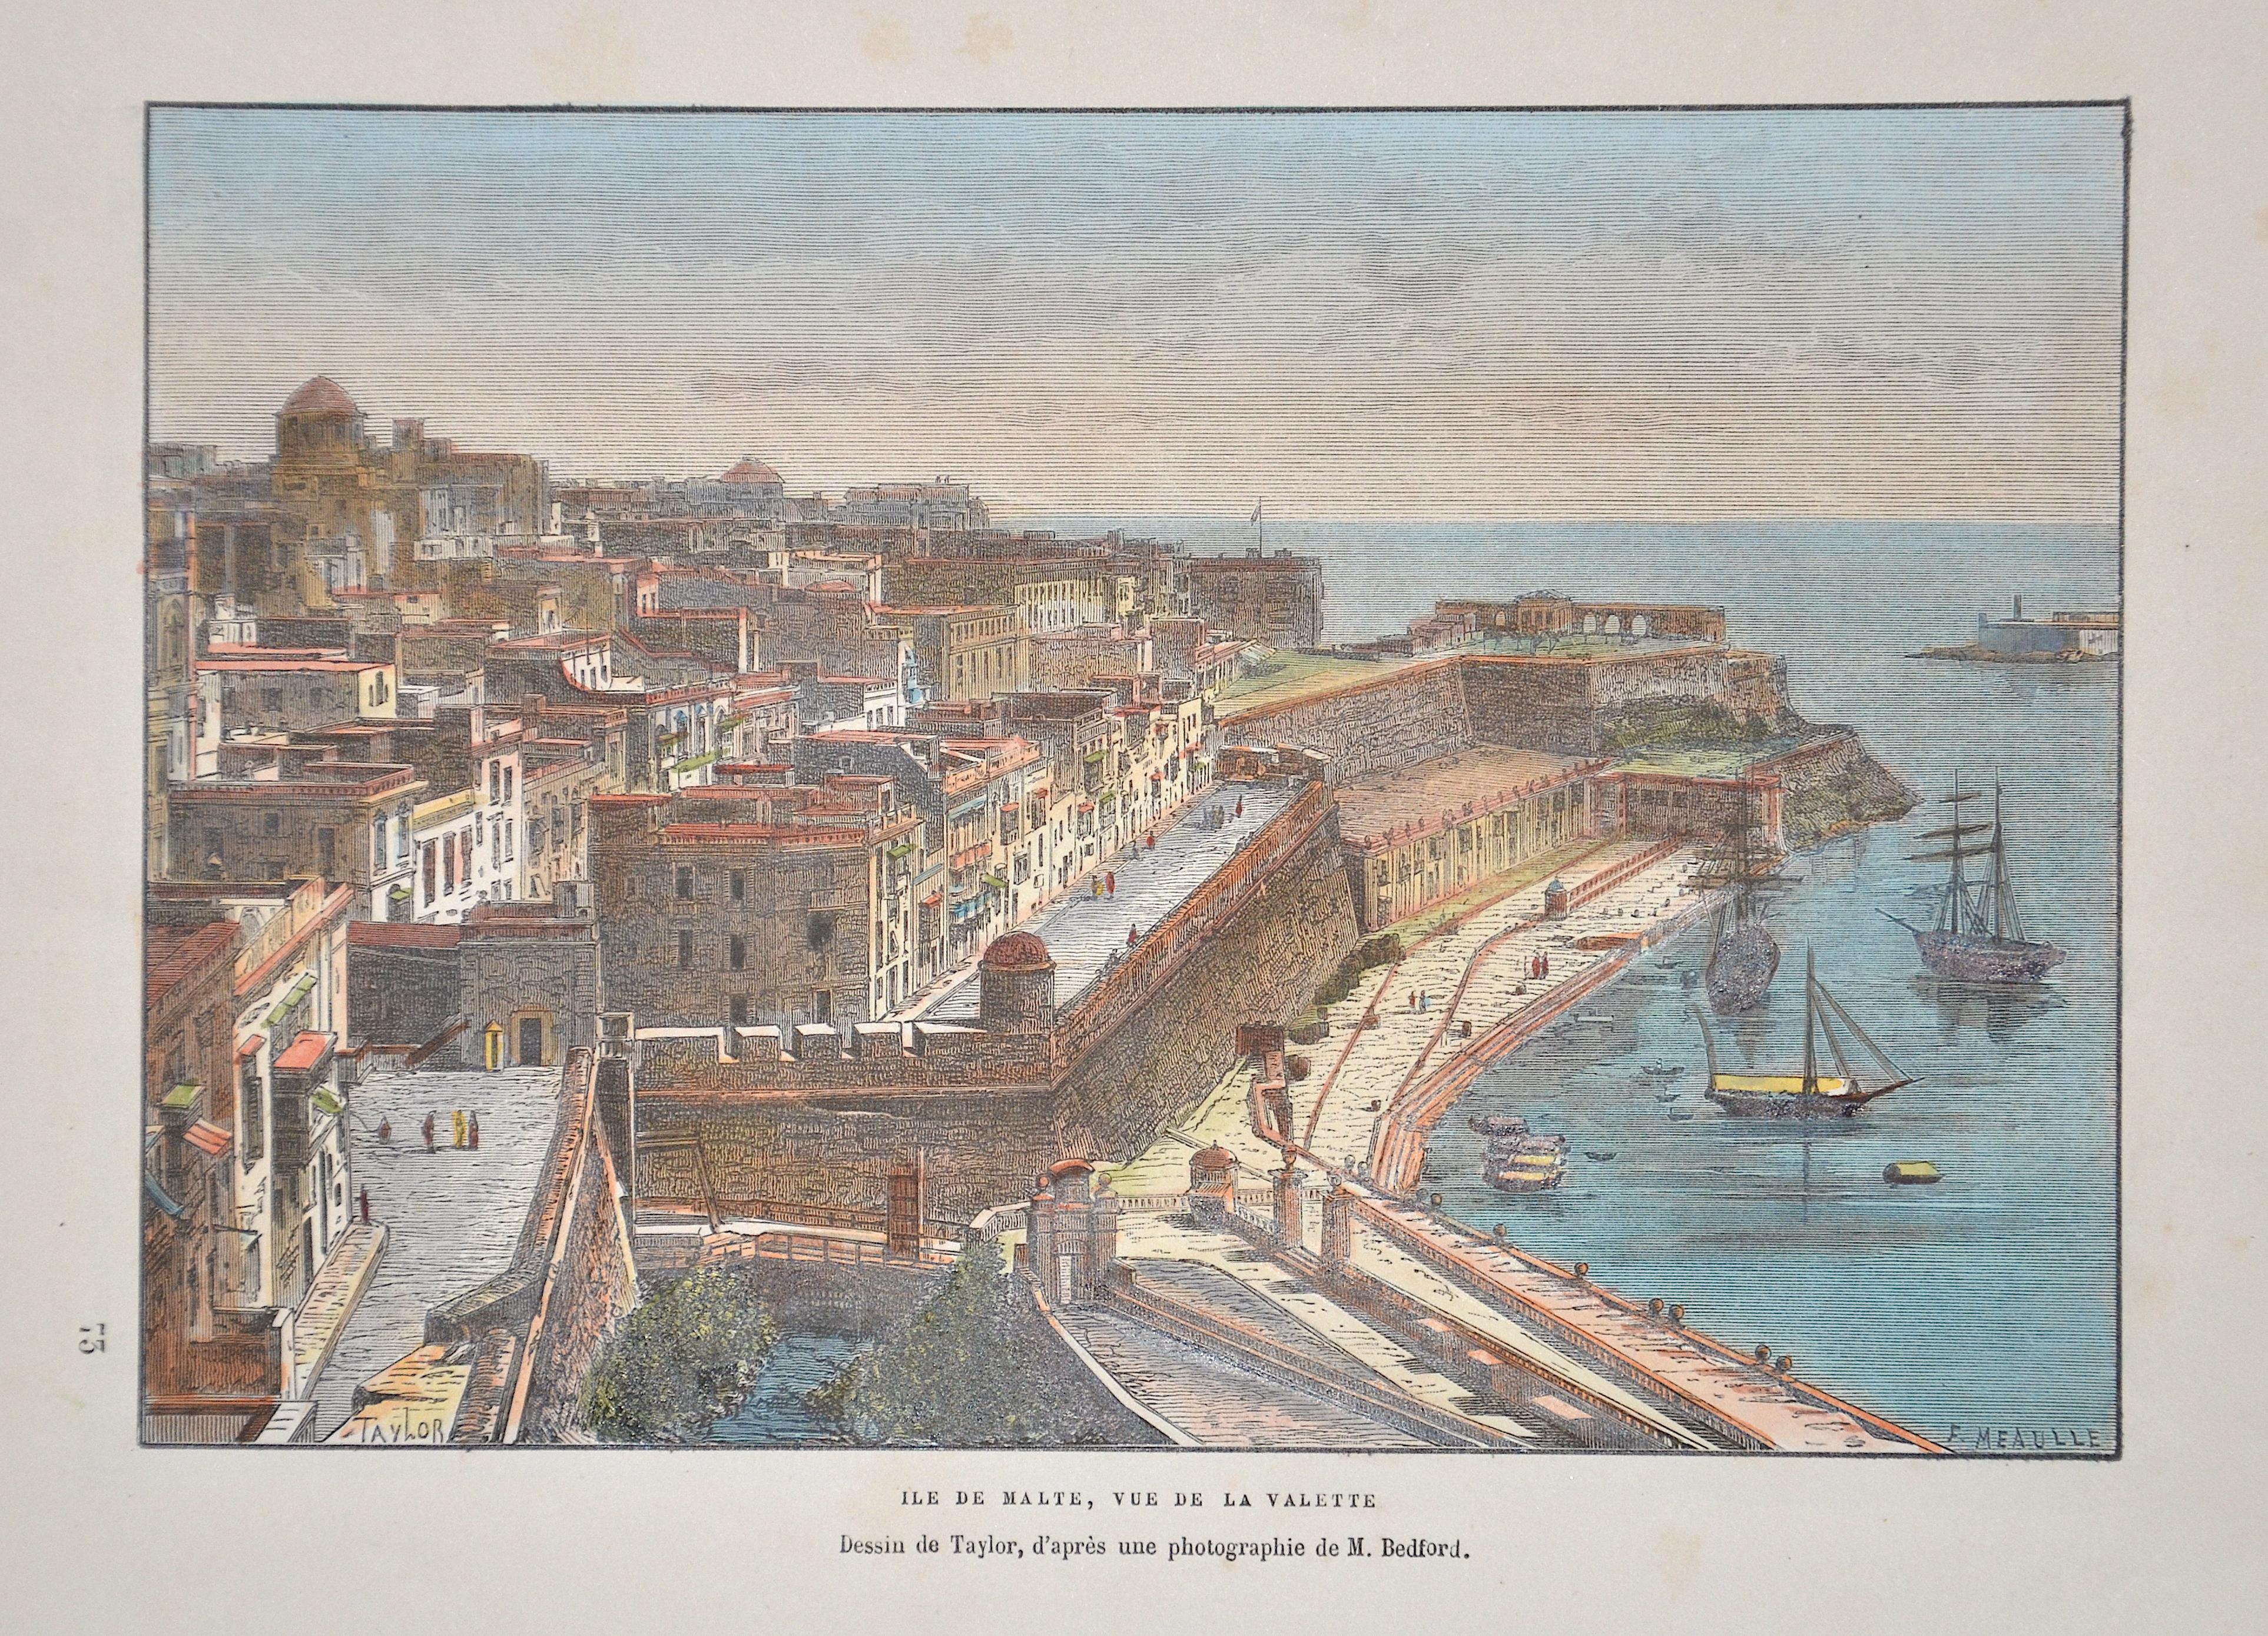 Meaulle F. Ile de Malte, Vue de la Valette